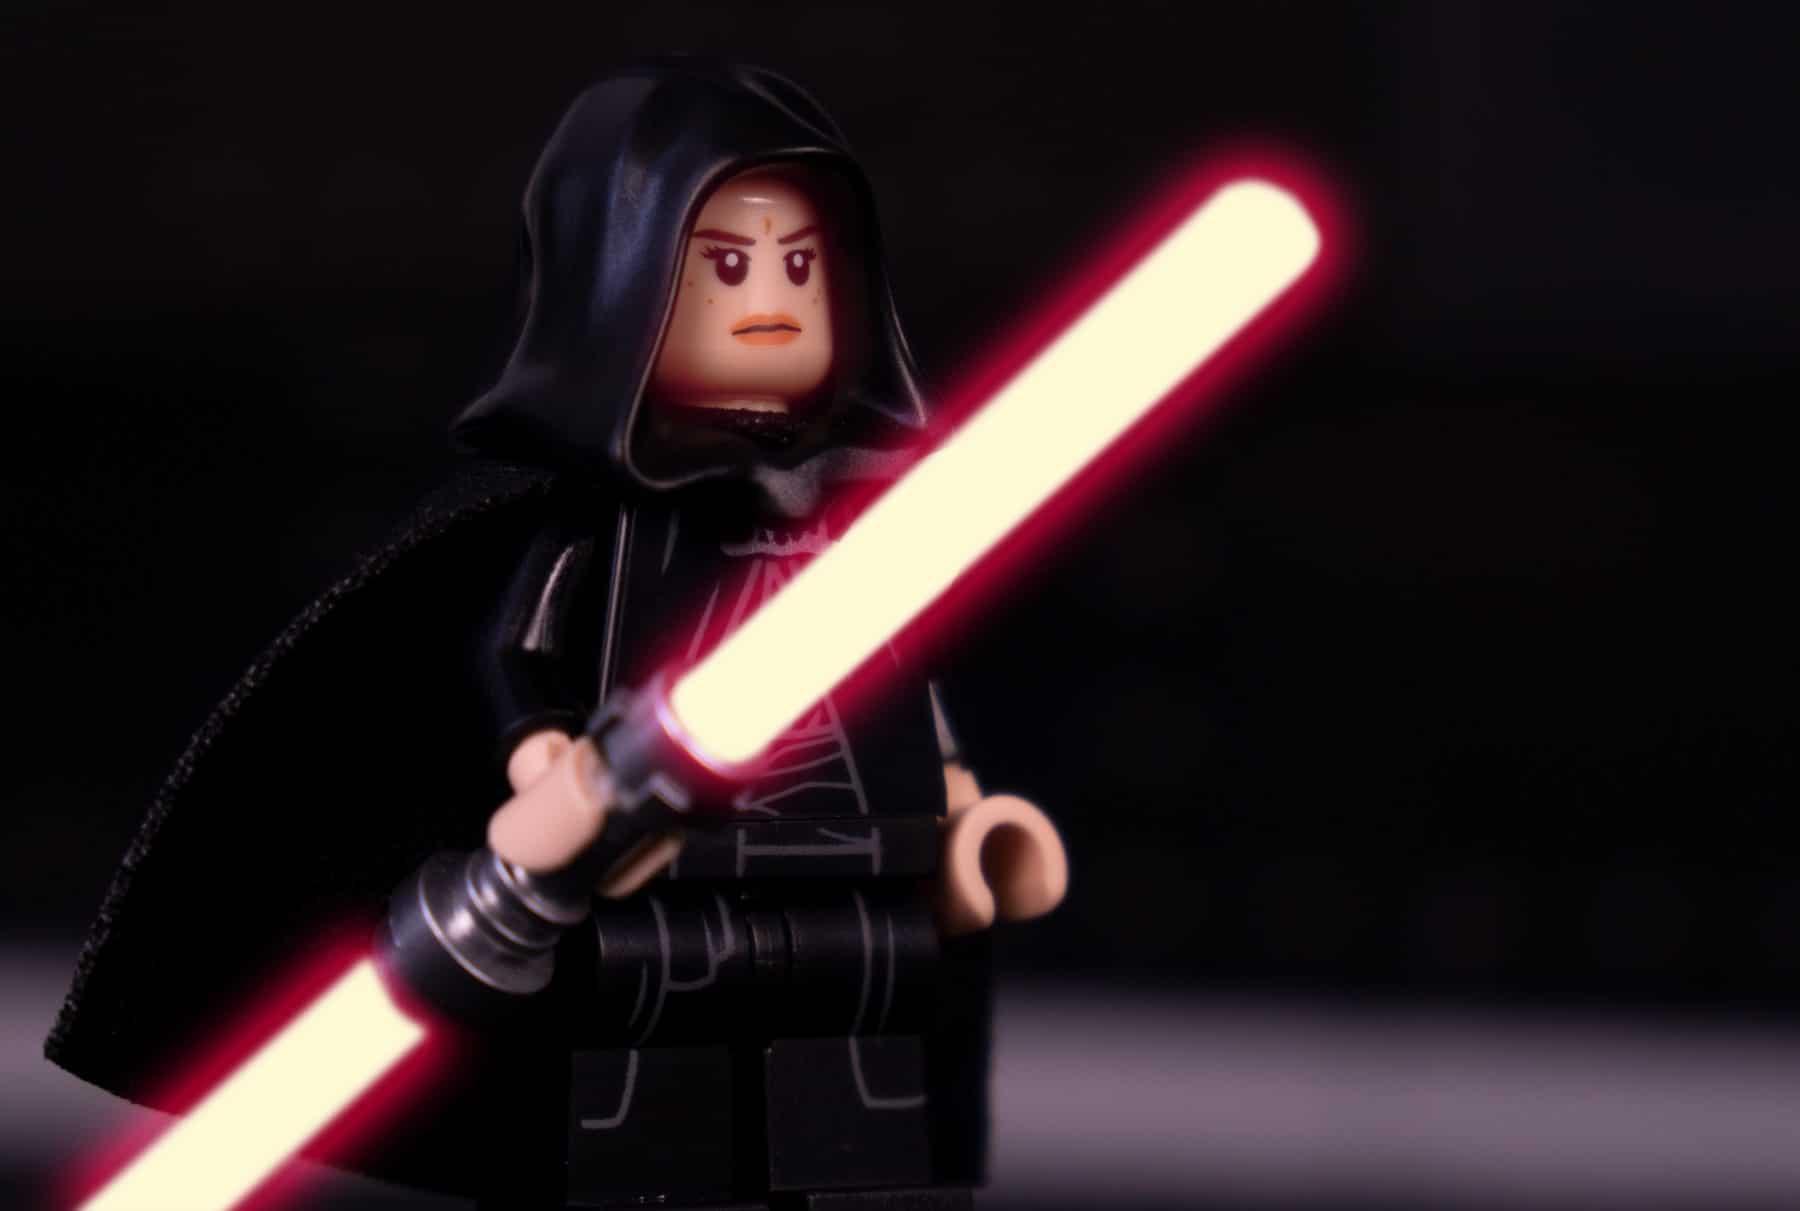 Dark Side Rey LEGO Minifigur